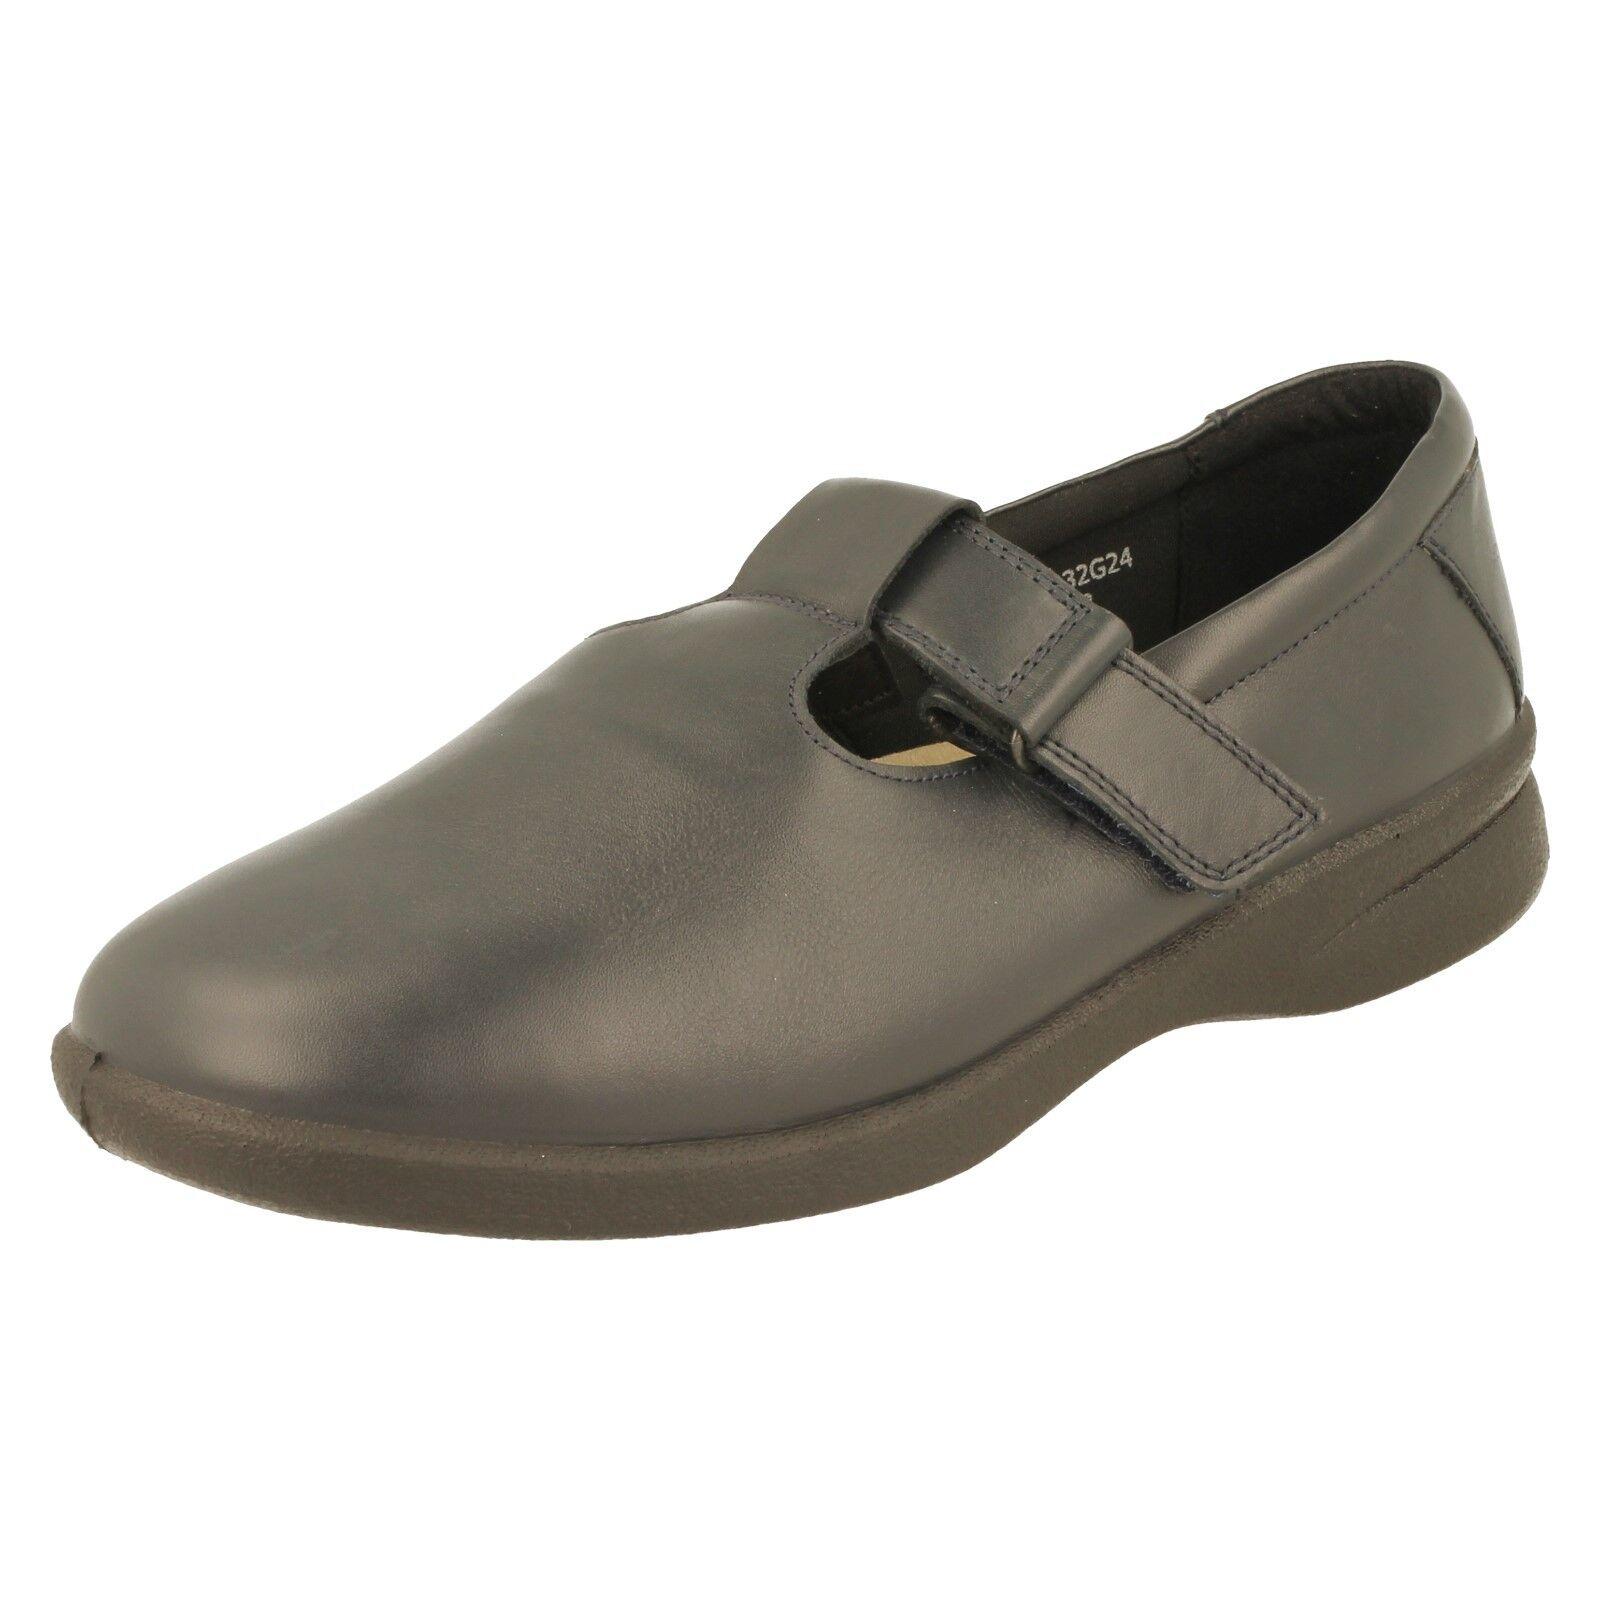 Padders Padders Padders Mujer Barra T Zapatos - Relax  Mejor precio